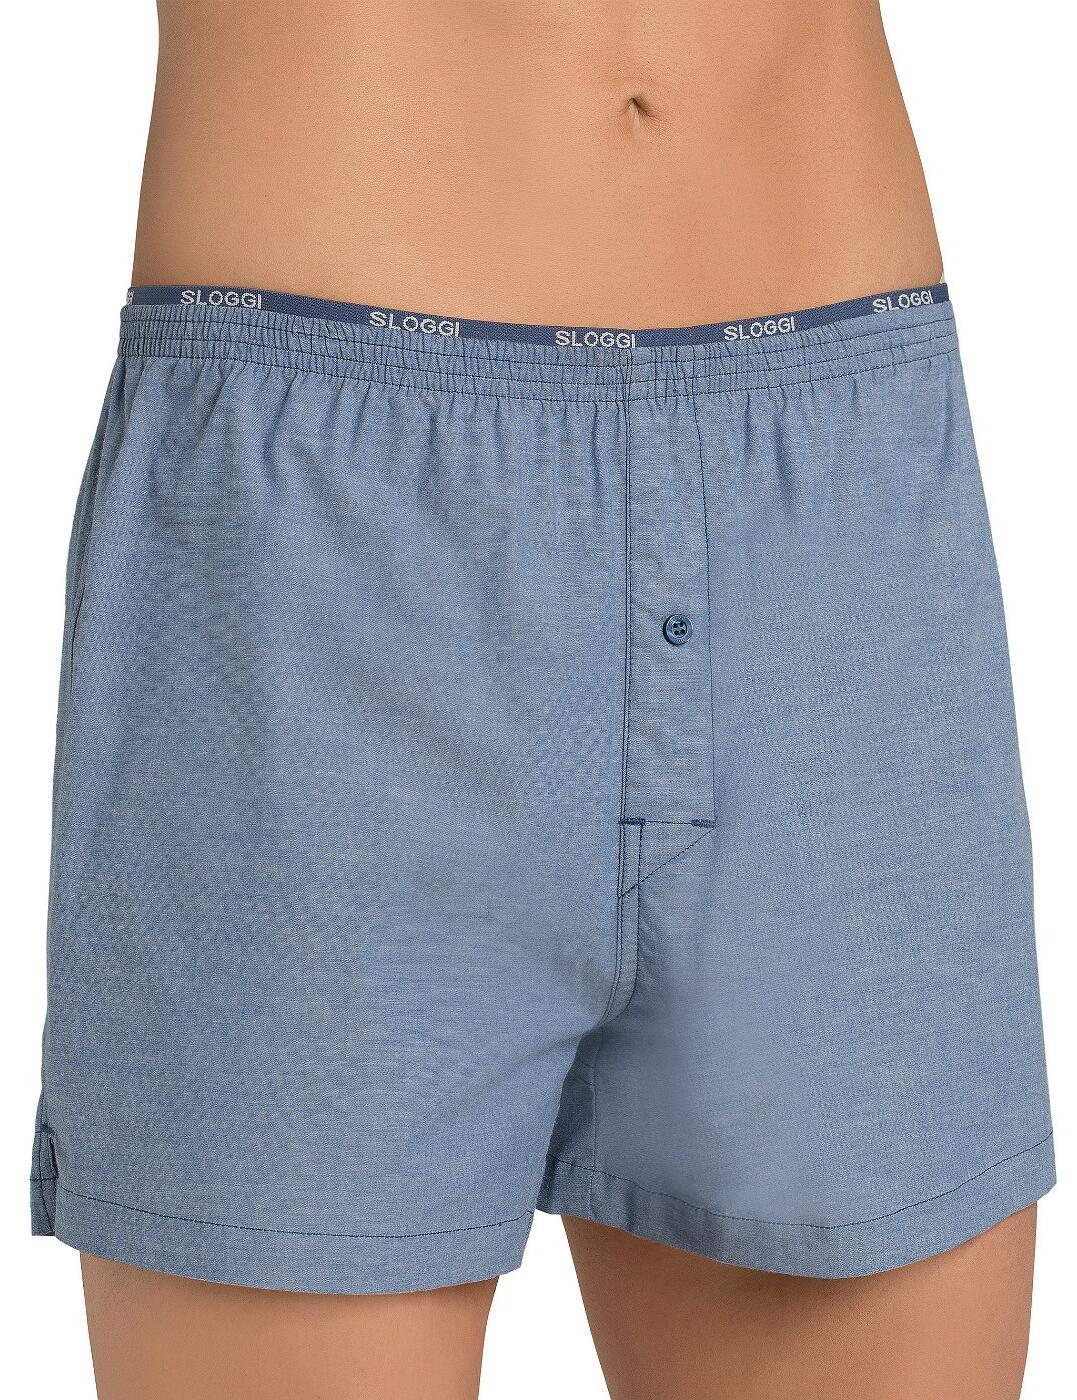 10154631 Sloggi Men Freedom Stretch Boxer Short - 10154631 Midnight Blue